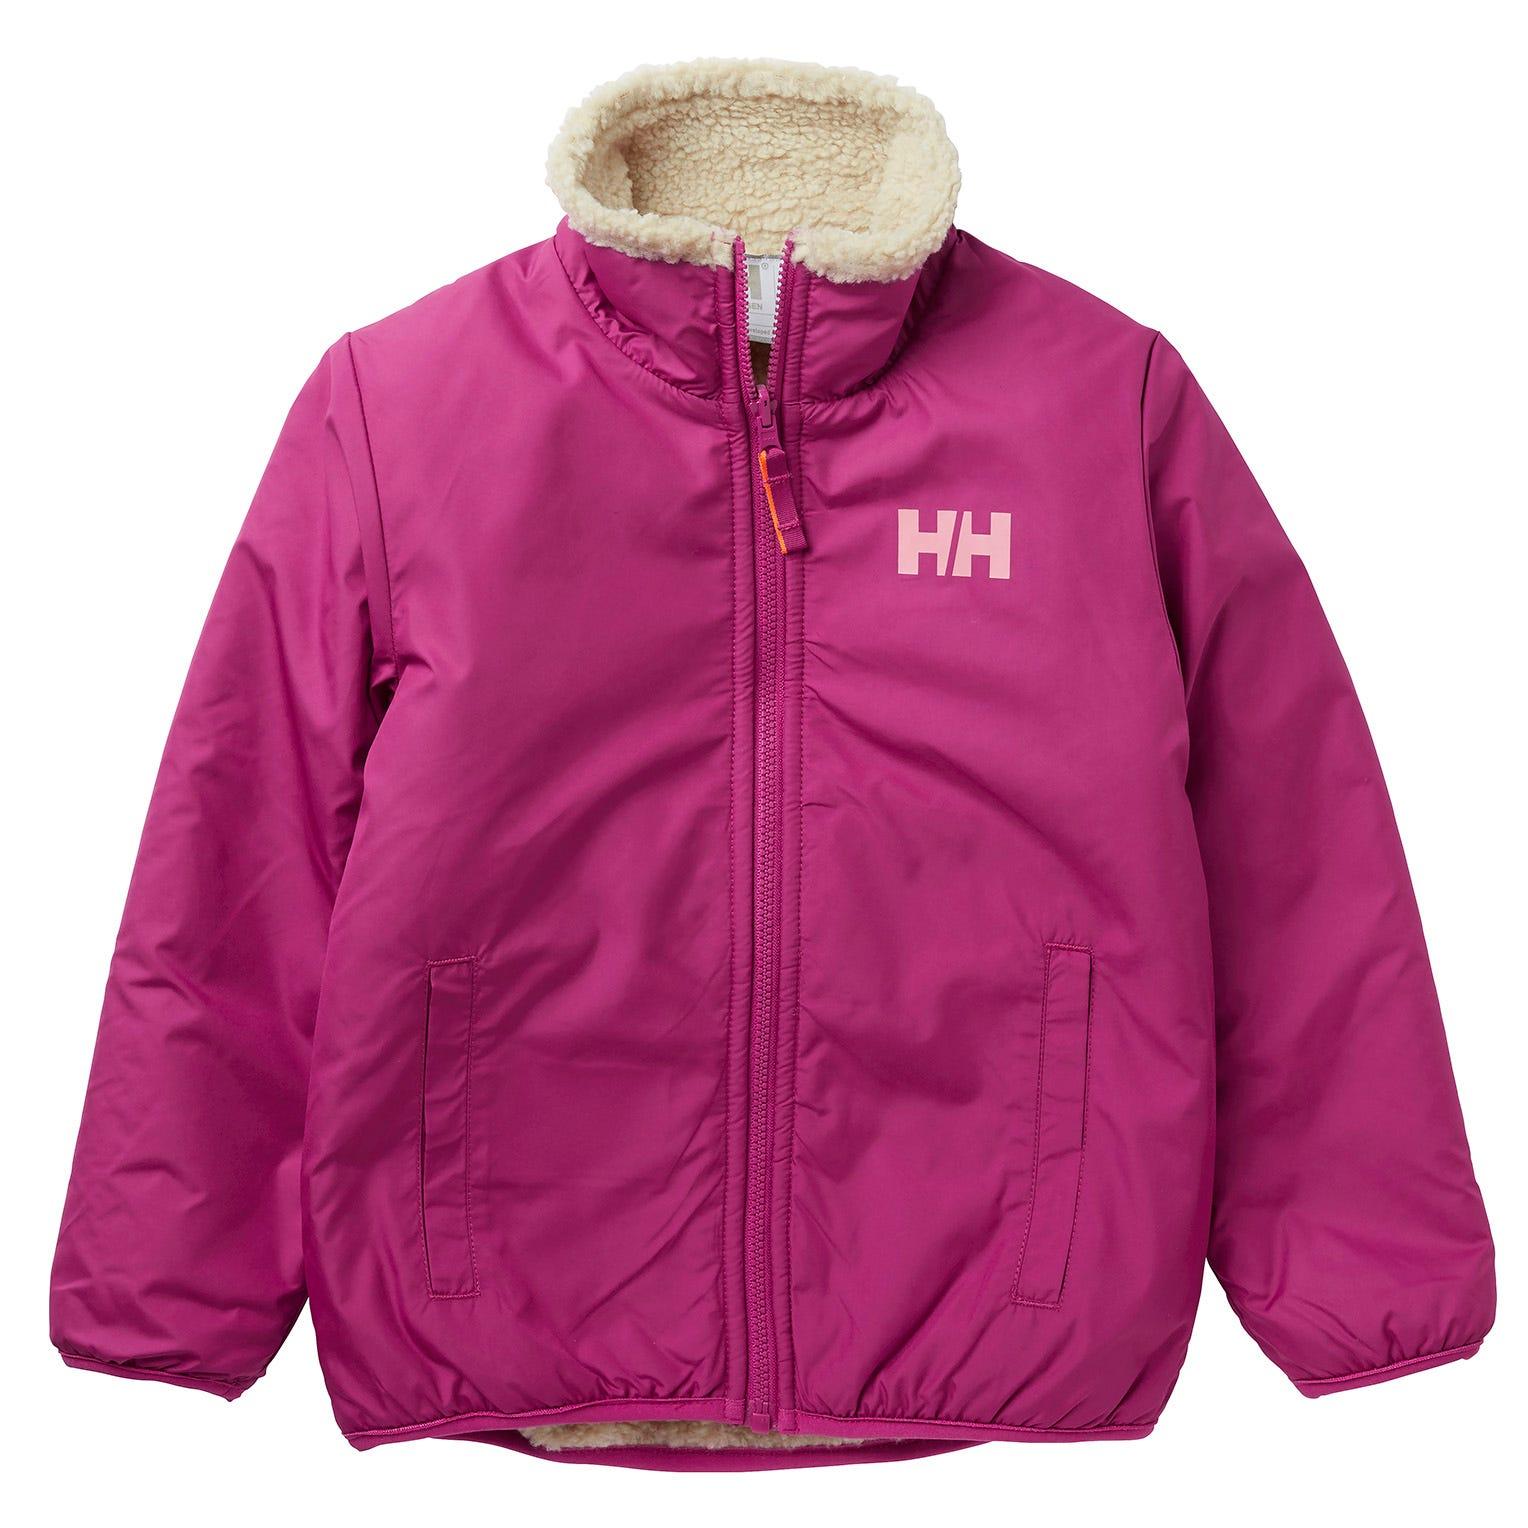 Helly Hansen Kids Reversible Pile Jacket Parka Yellow 134/9